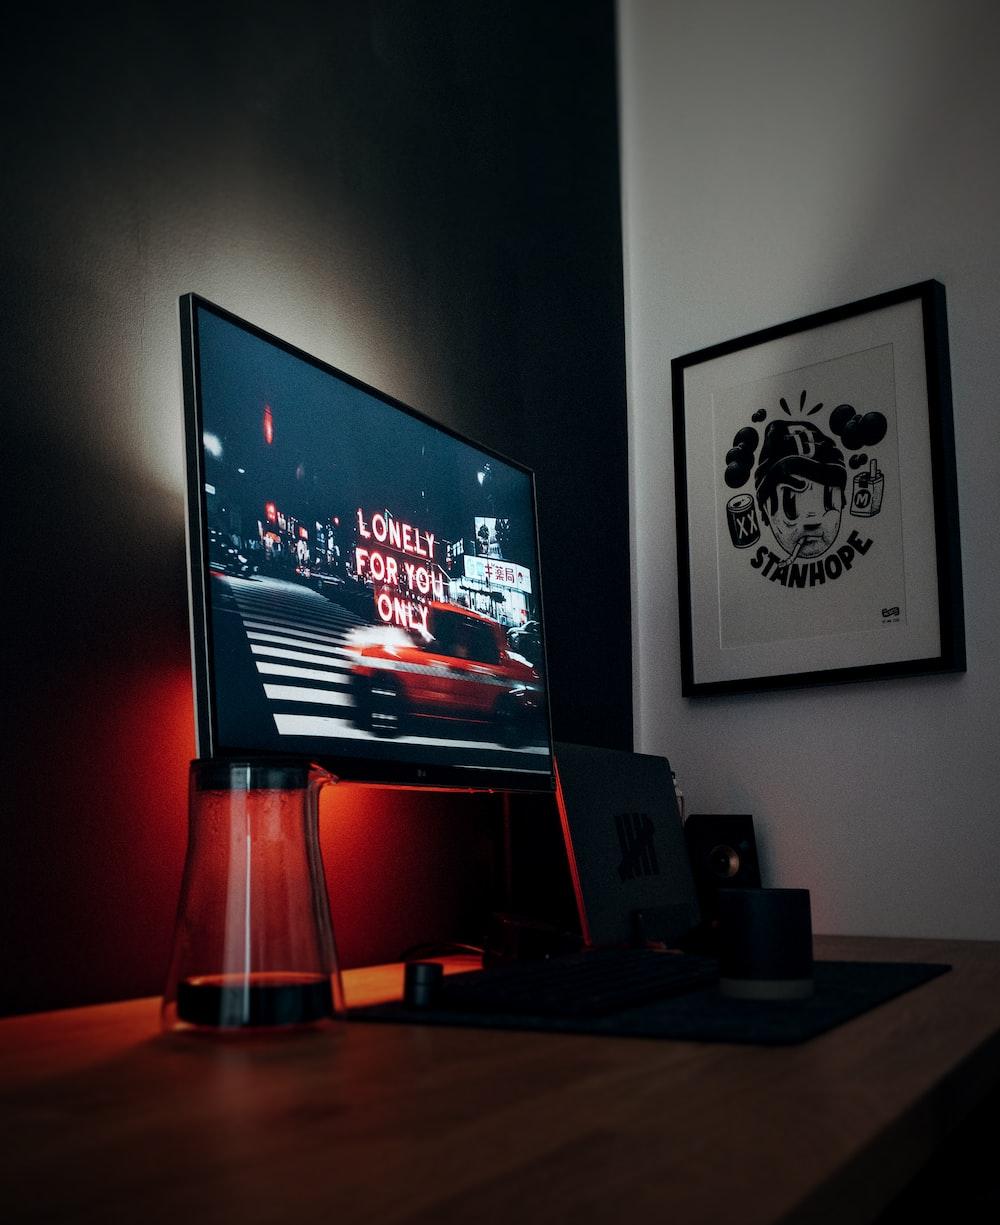 black flat screen tv turned on near black speaker